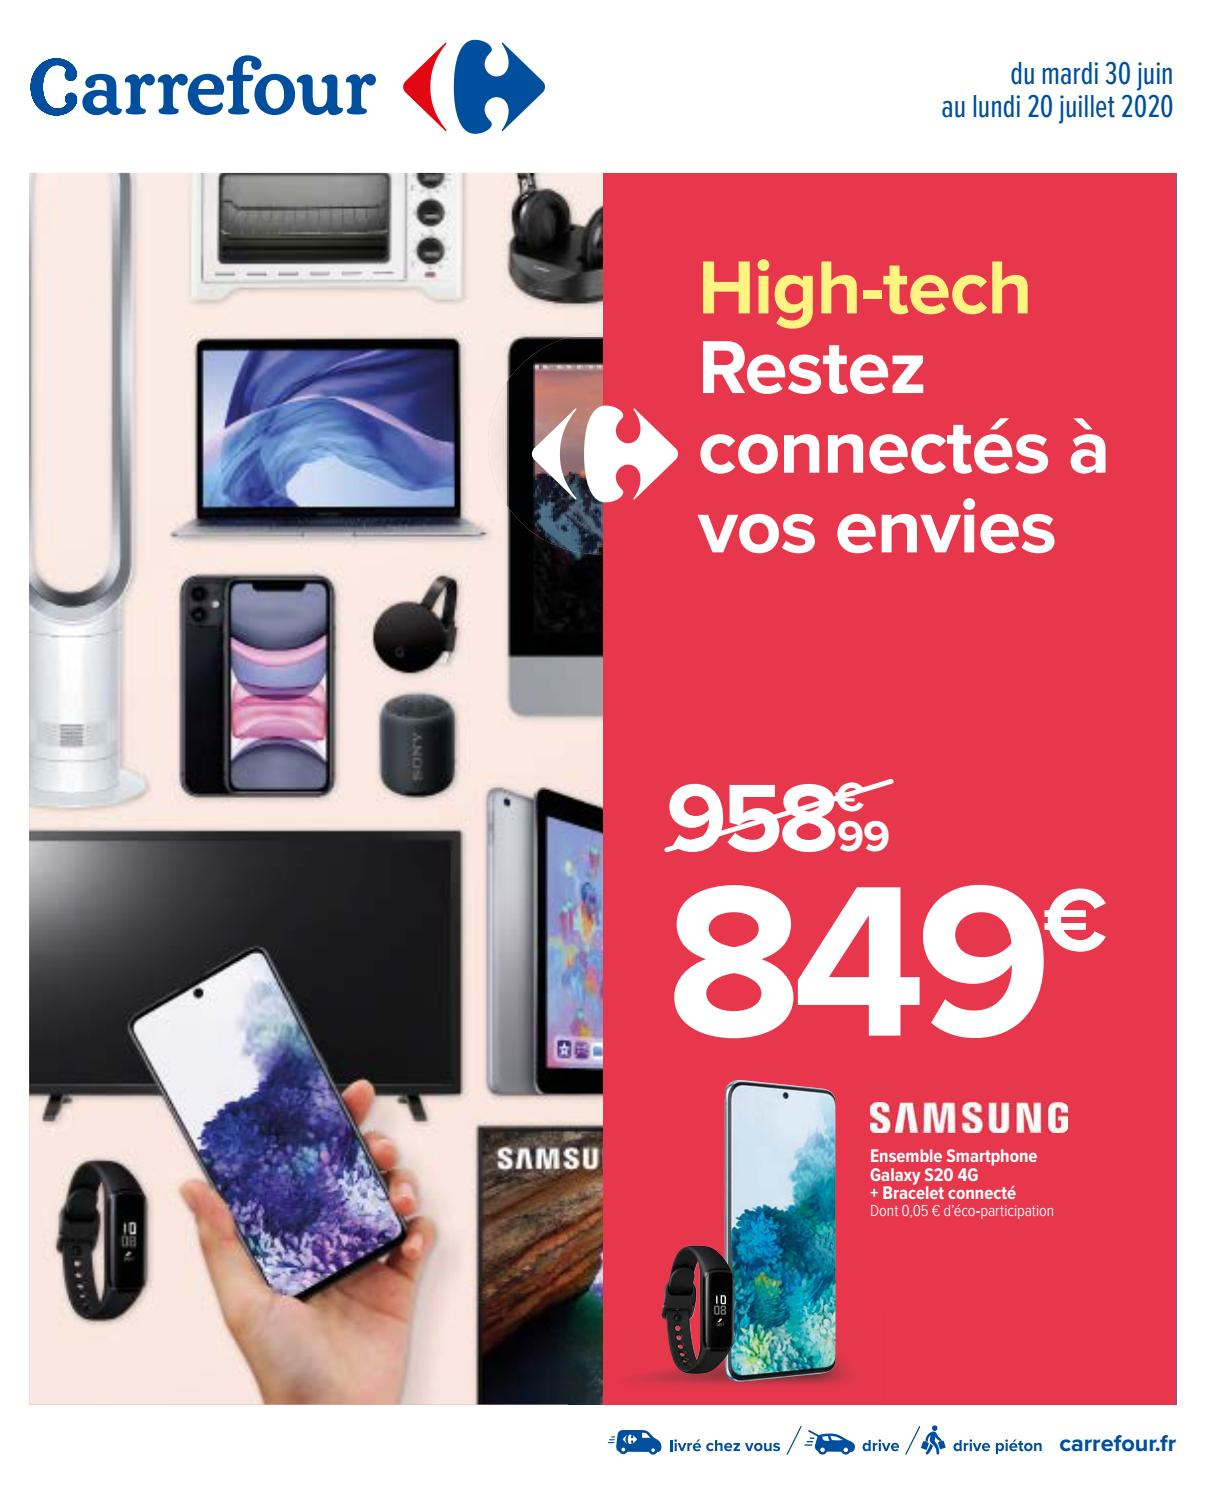 carrefour france catalogue 11 high